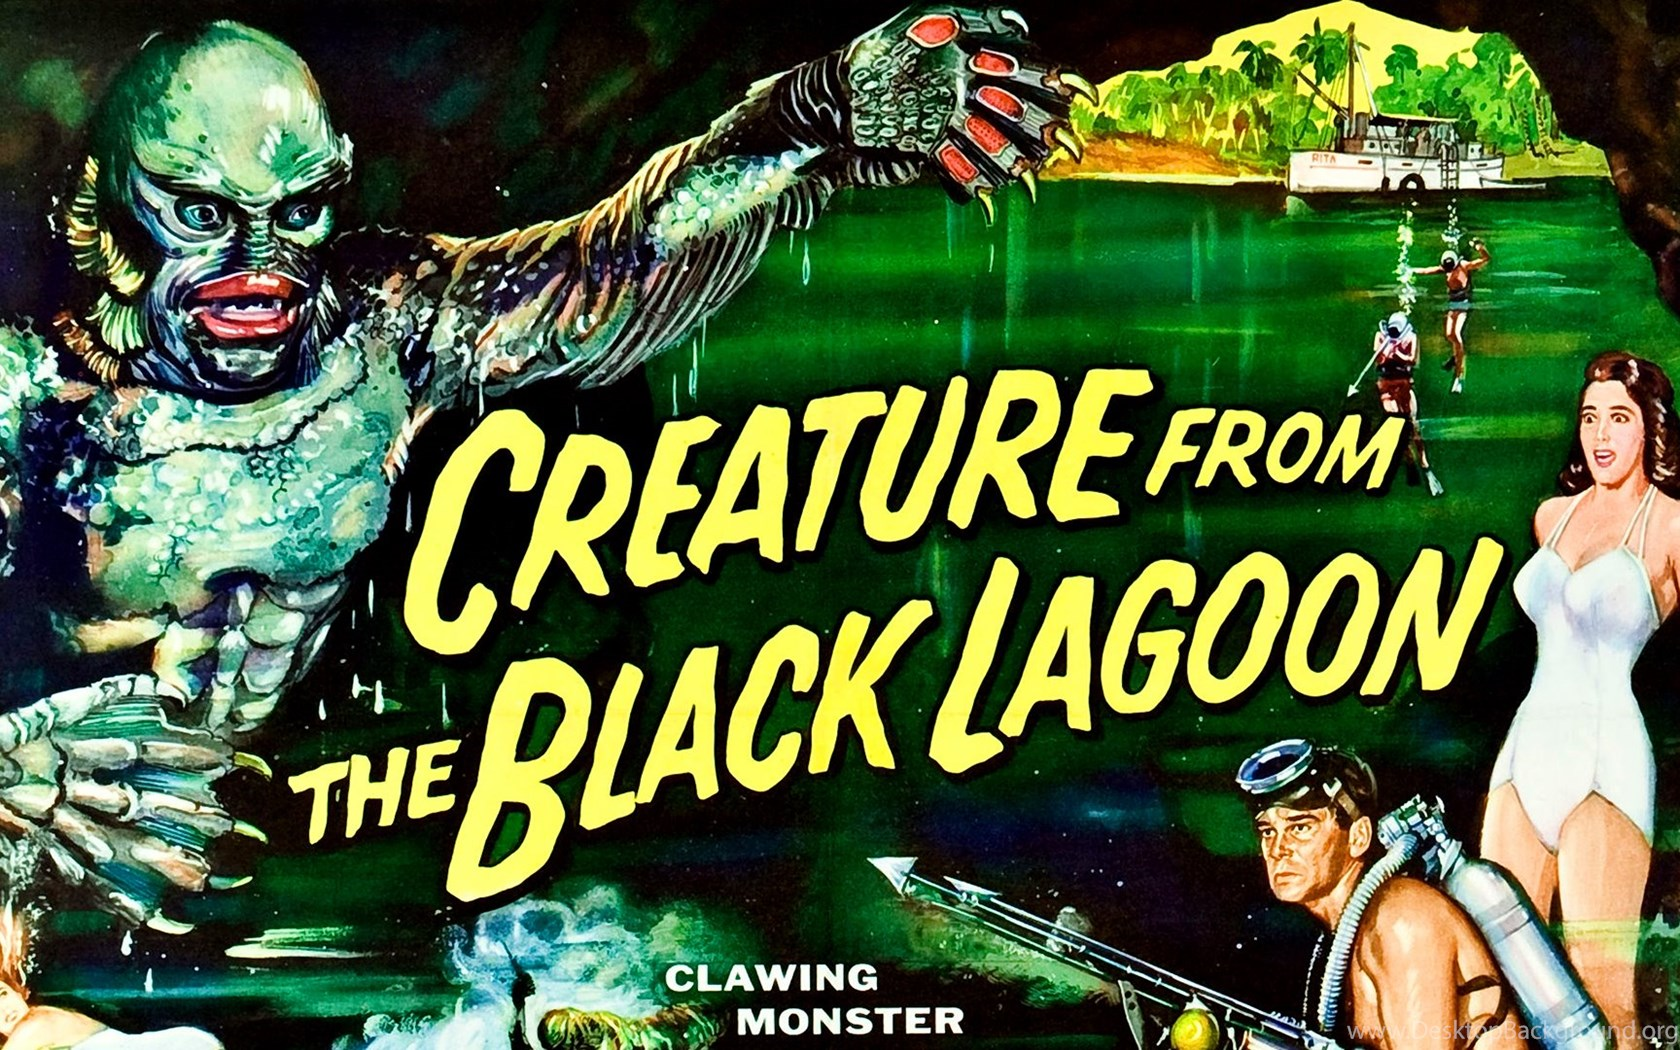 Creature From The Black Lagoon 1954 Movies Film Cine Com